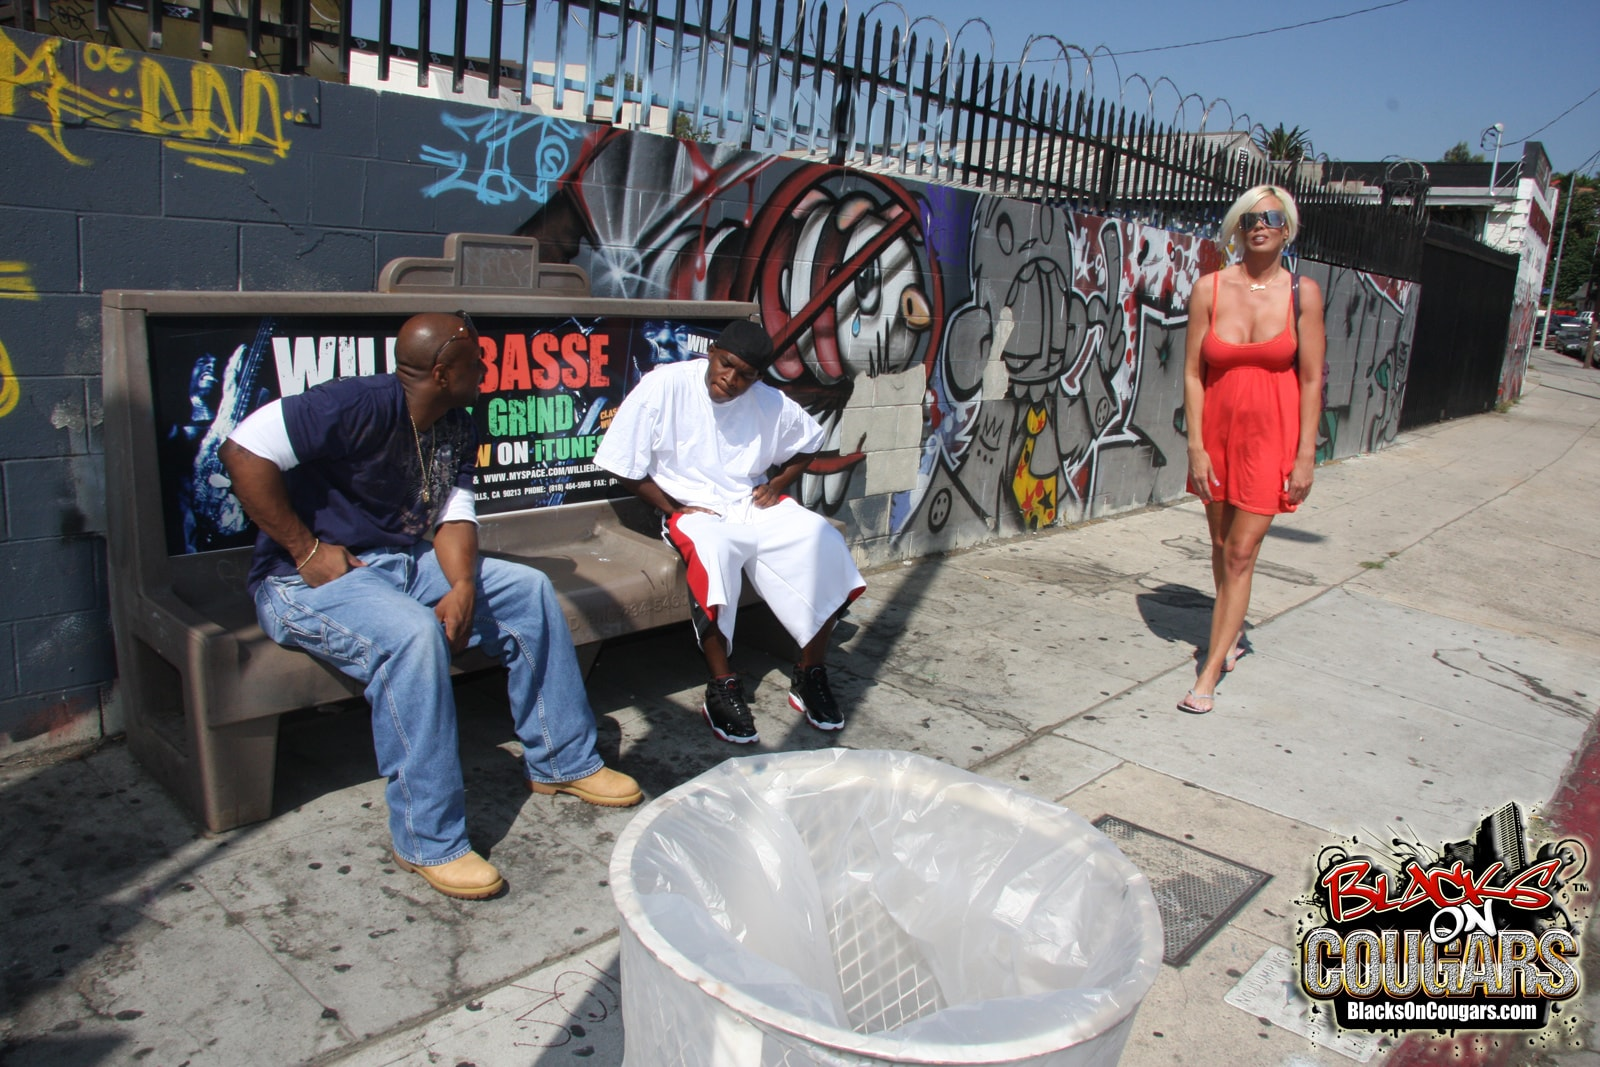 Dogfart '- Blacks On Cougars' starring Jordan Blue (Photo 2)